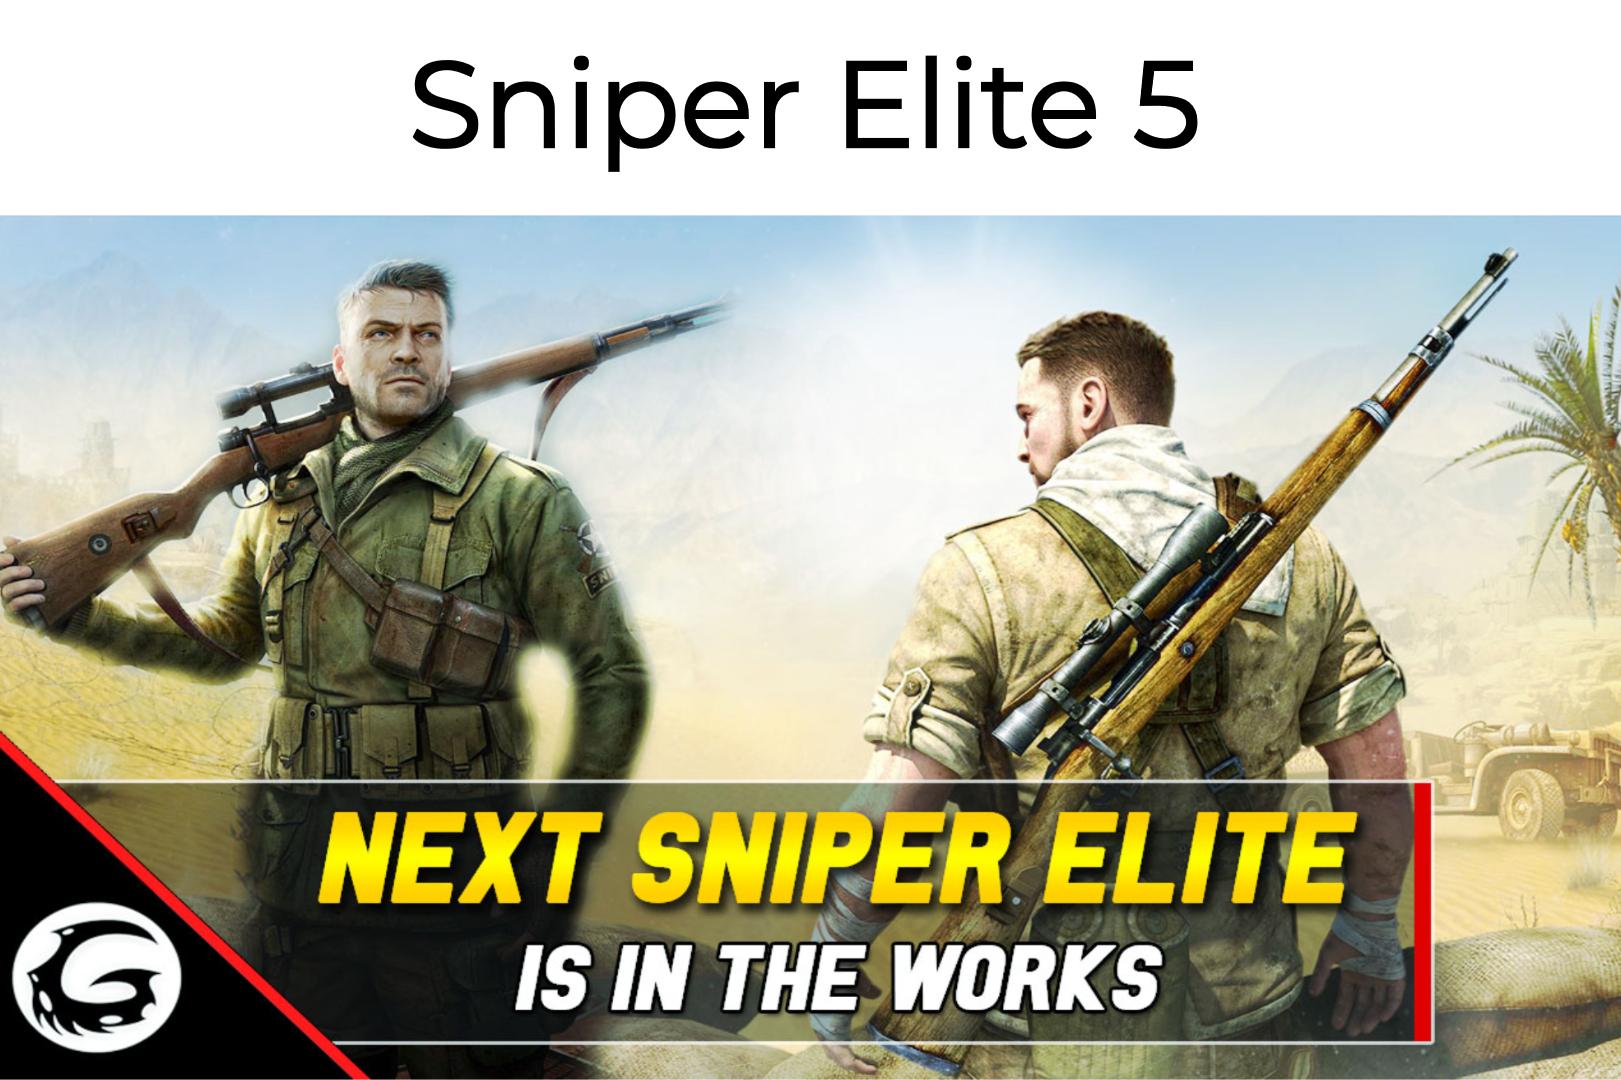 Sniper Elite 5 Release Date, SNiper Elite 5 Rumors and Other Details